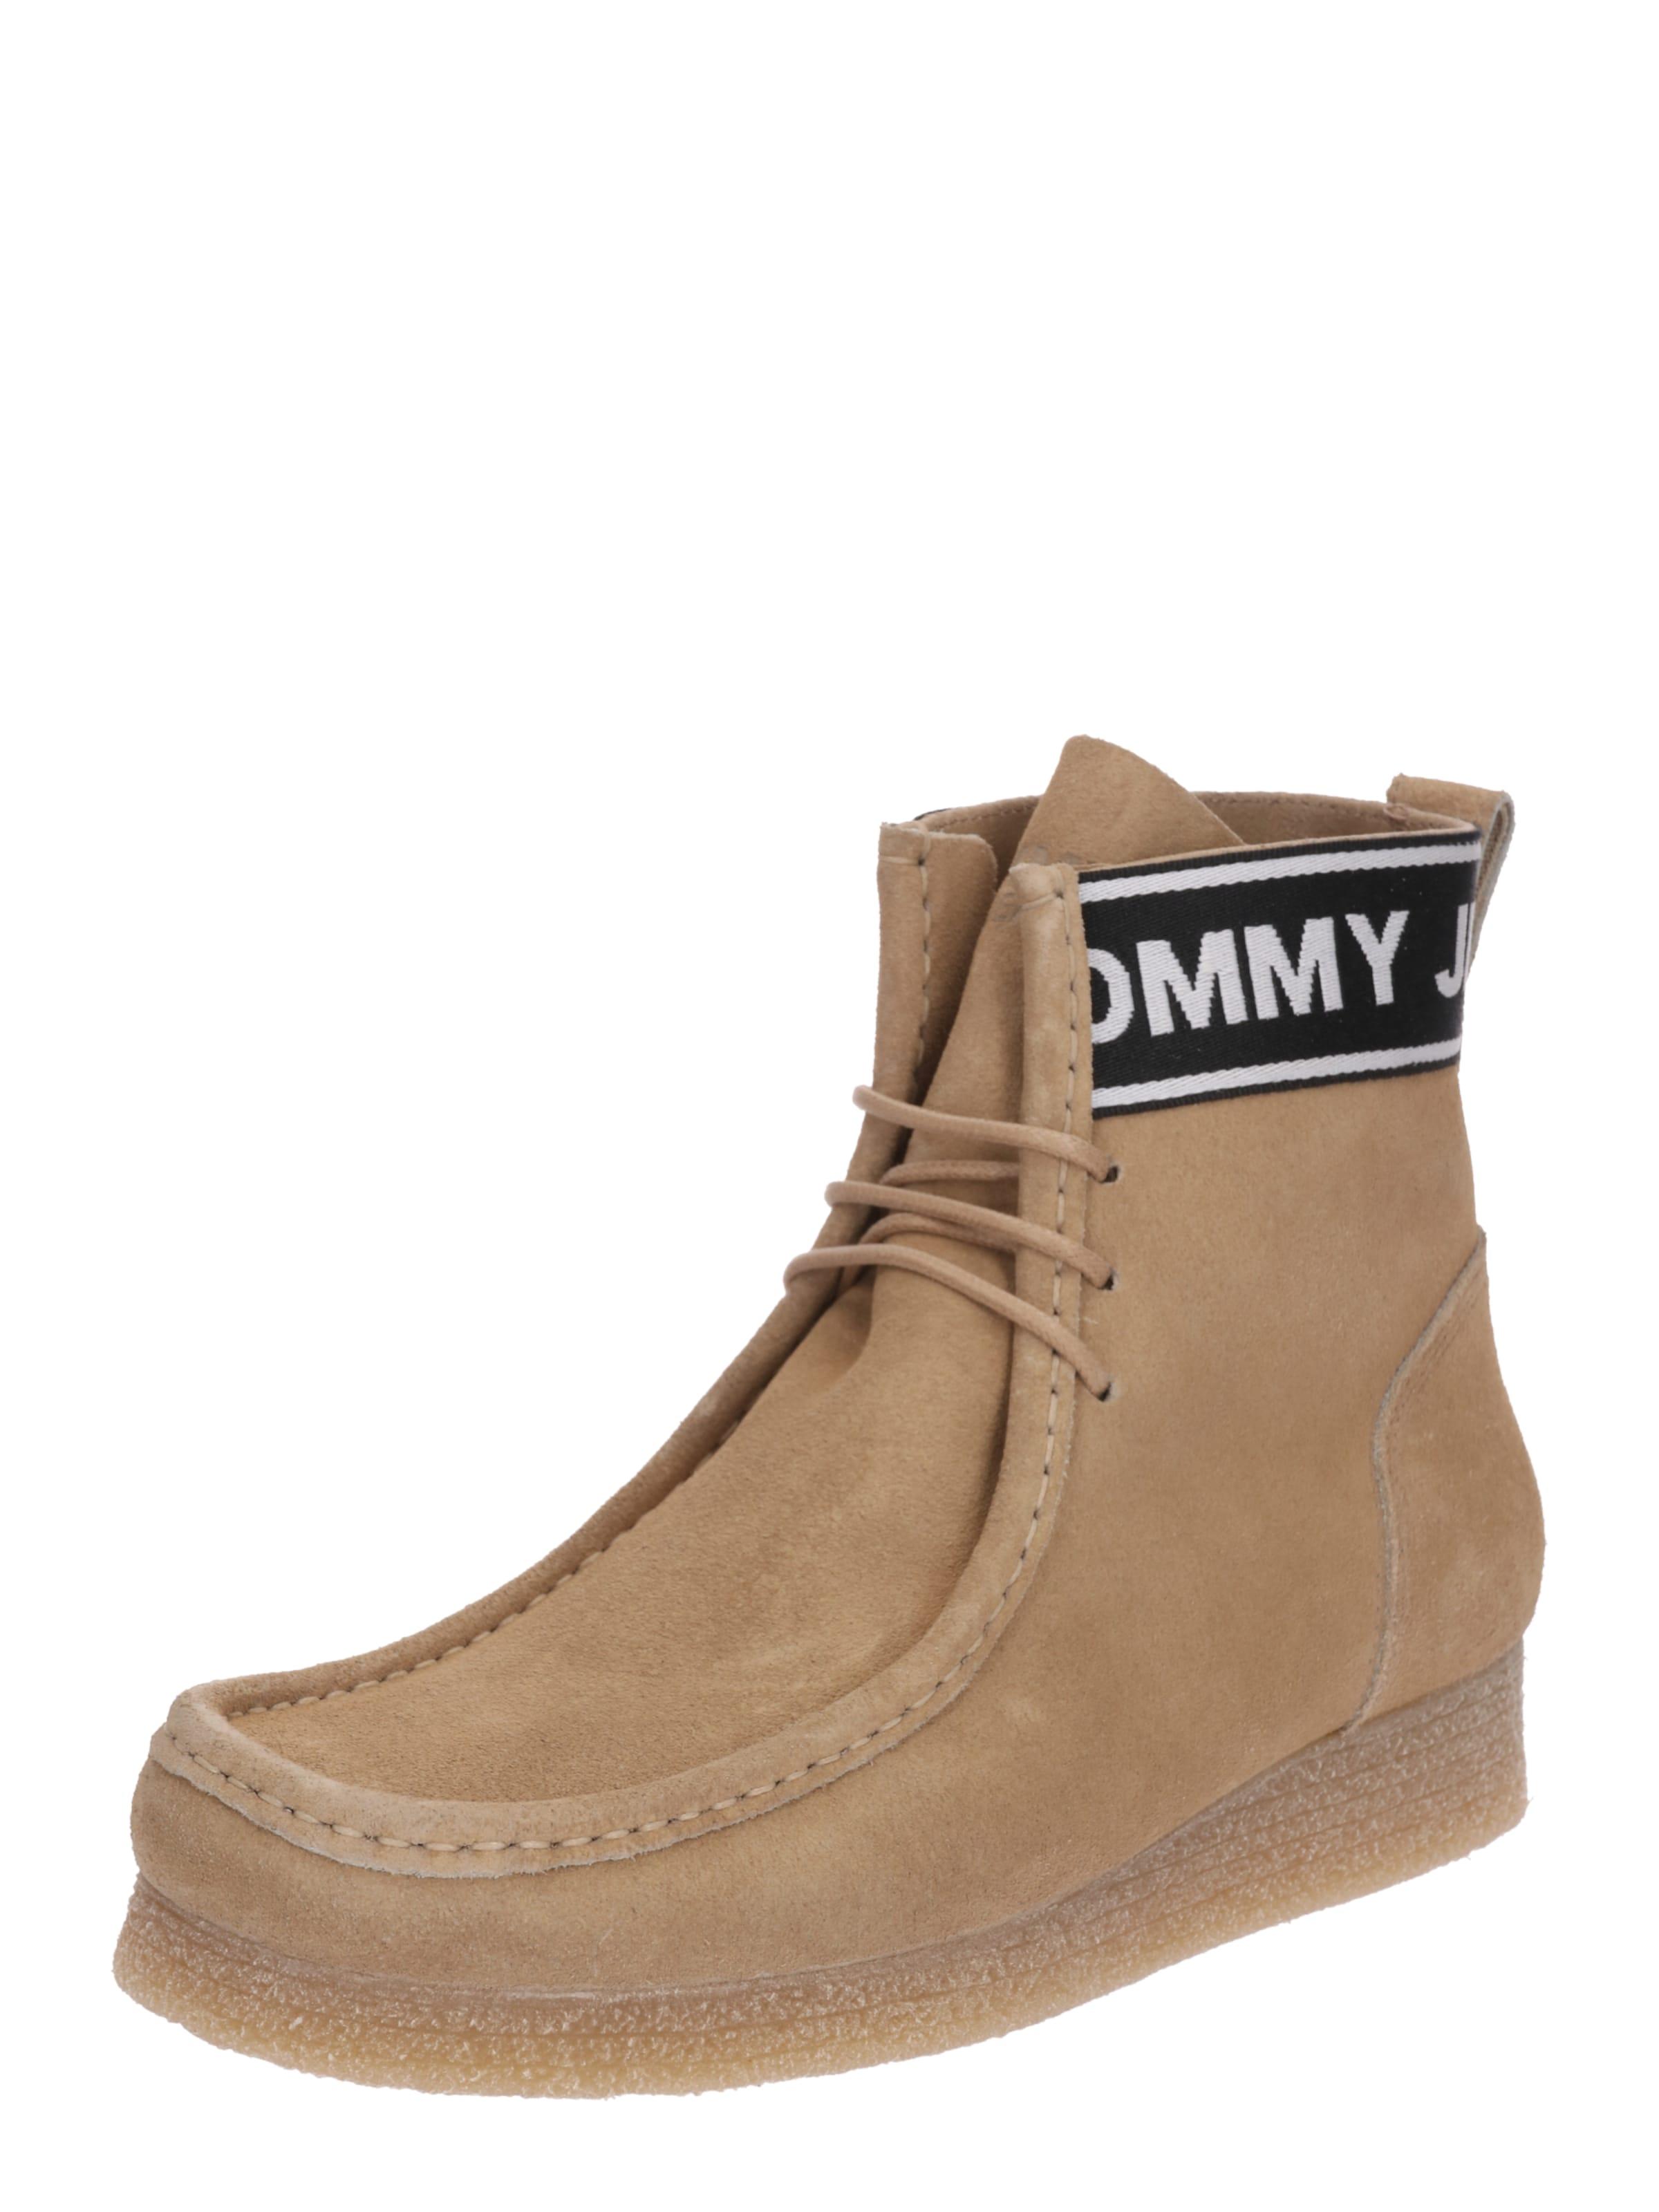 Haltbare Mode billige Schuhe Tommy Jeans | Stiefel 'Wallaby' Schuhe Gut getragene Schuhe